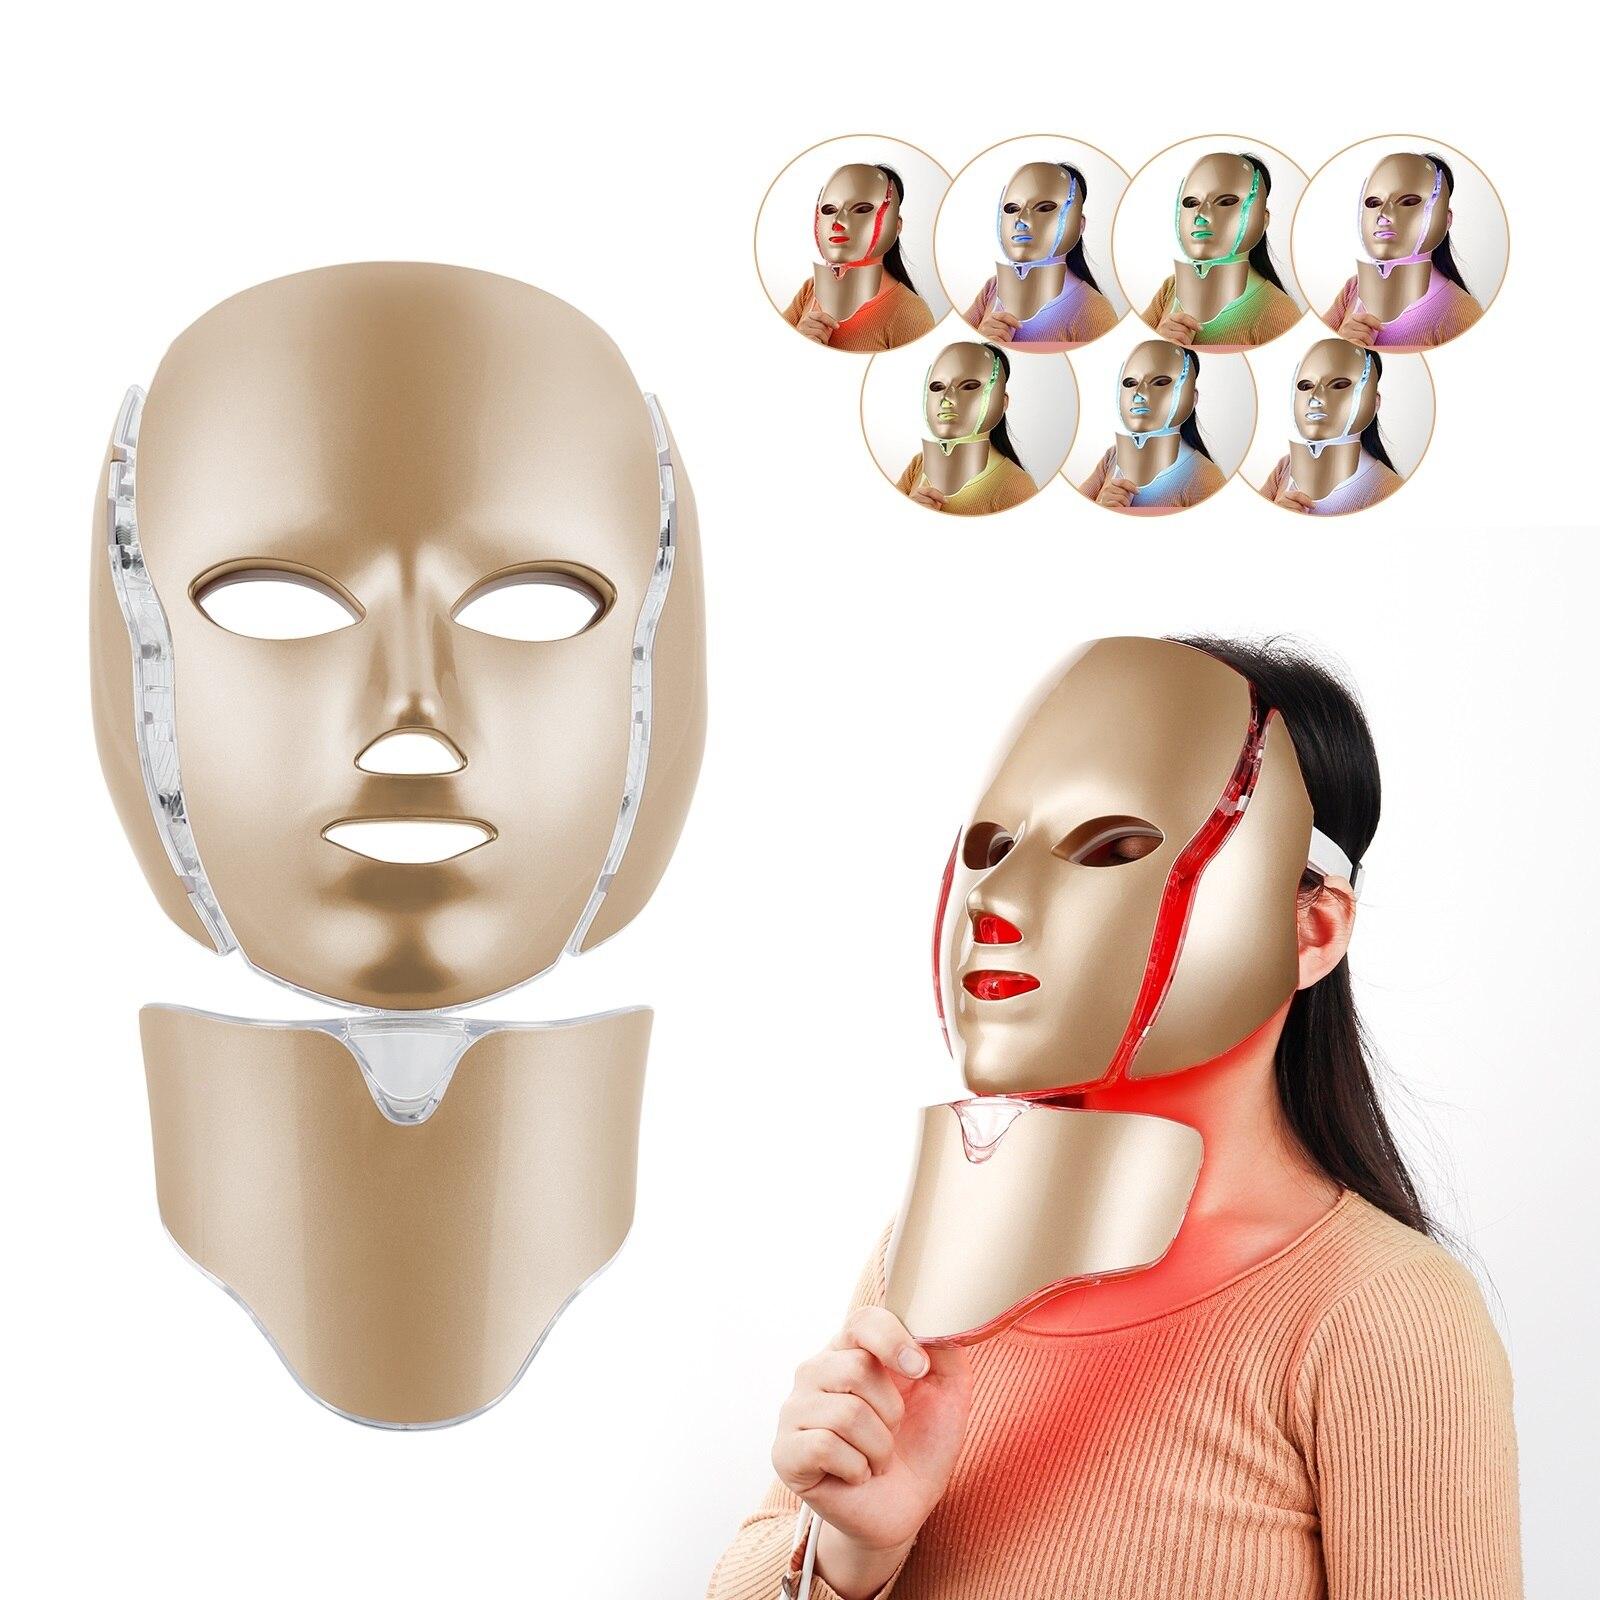 Facial Led Light Therapy Mask Anti Wrinkle Photorejuvenation Face Mask Brighten Spot Shrink Pores Beauty Machine Skin Tighten